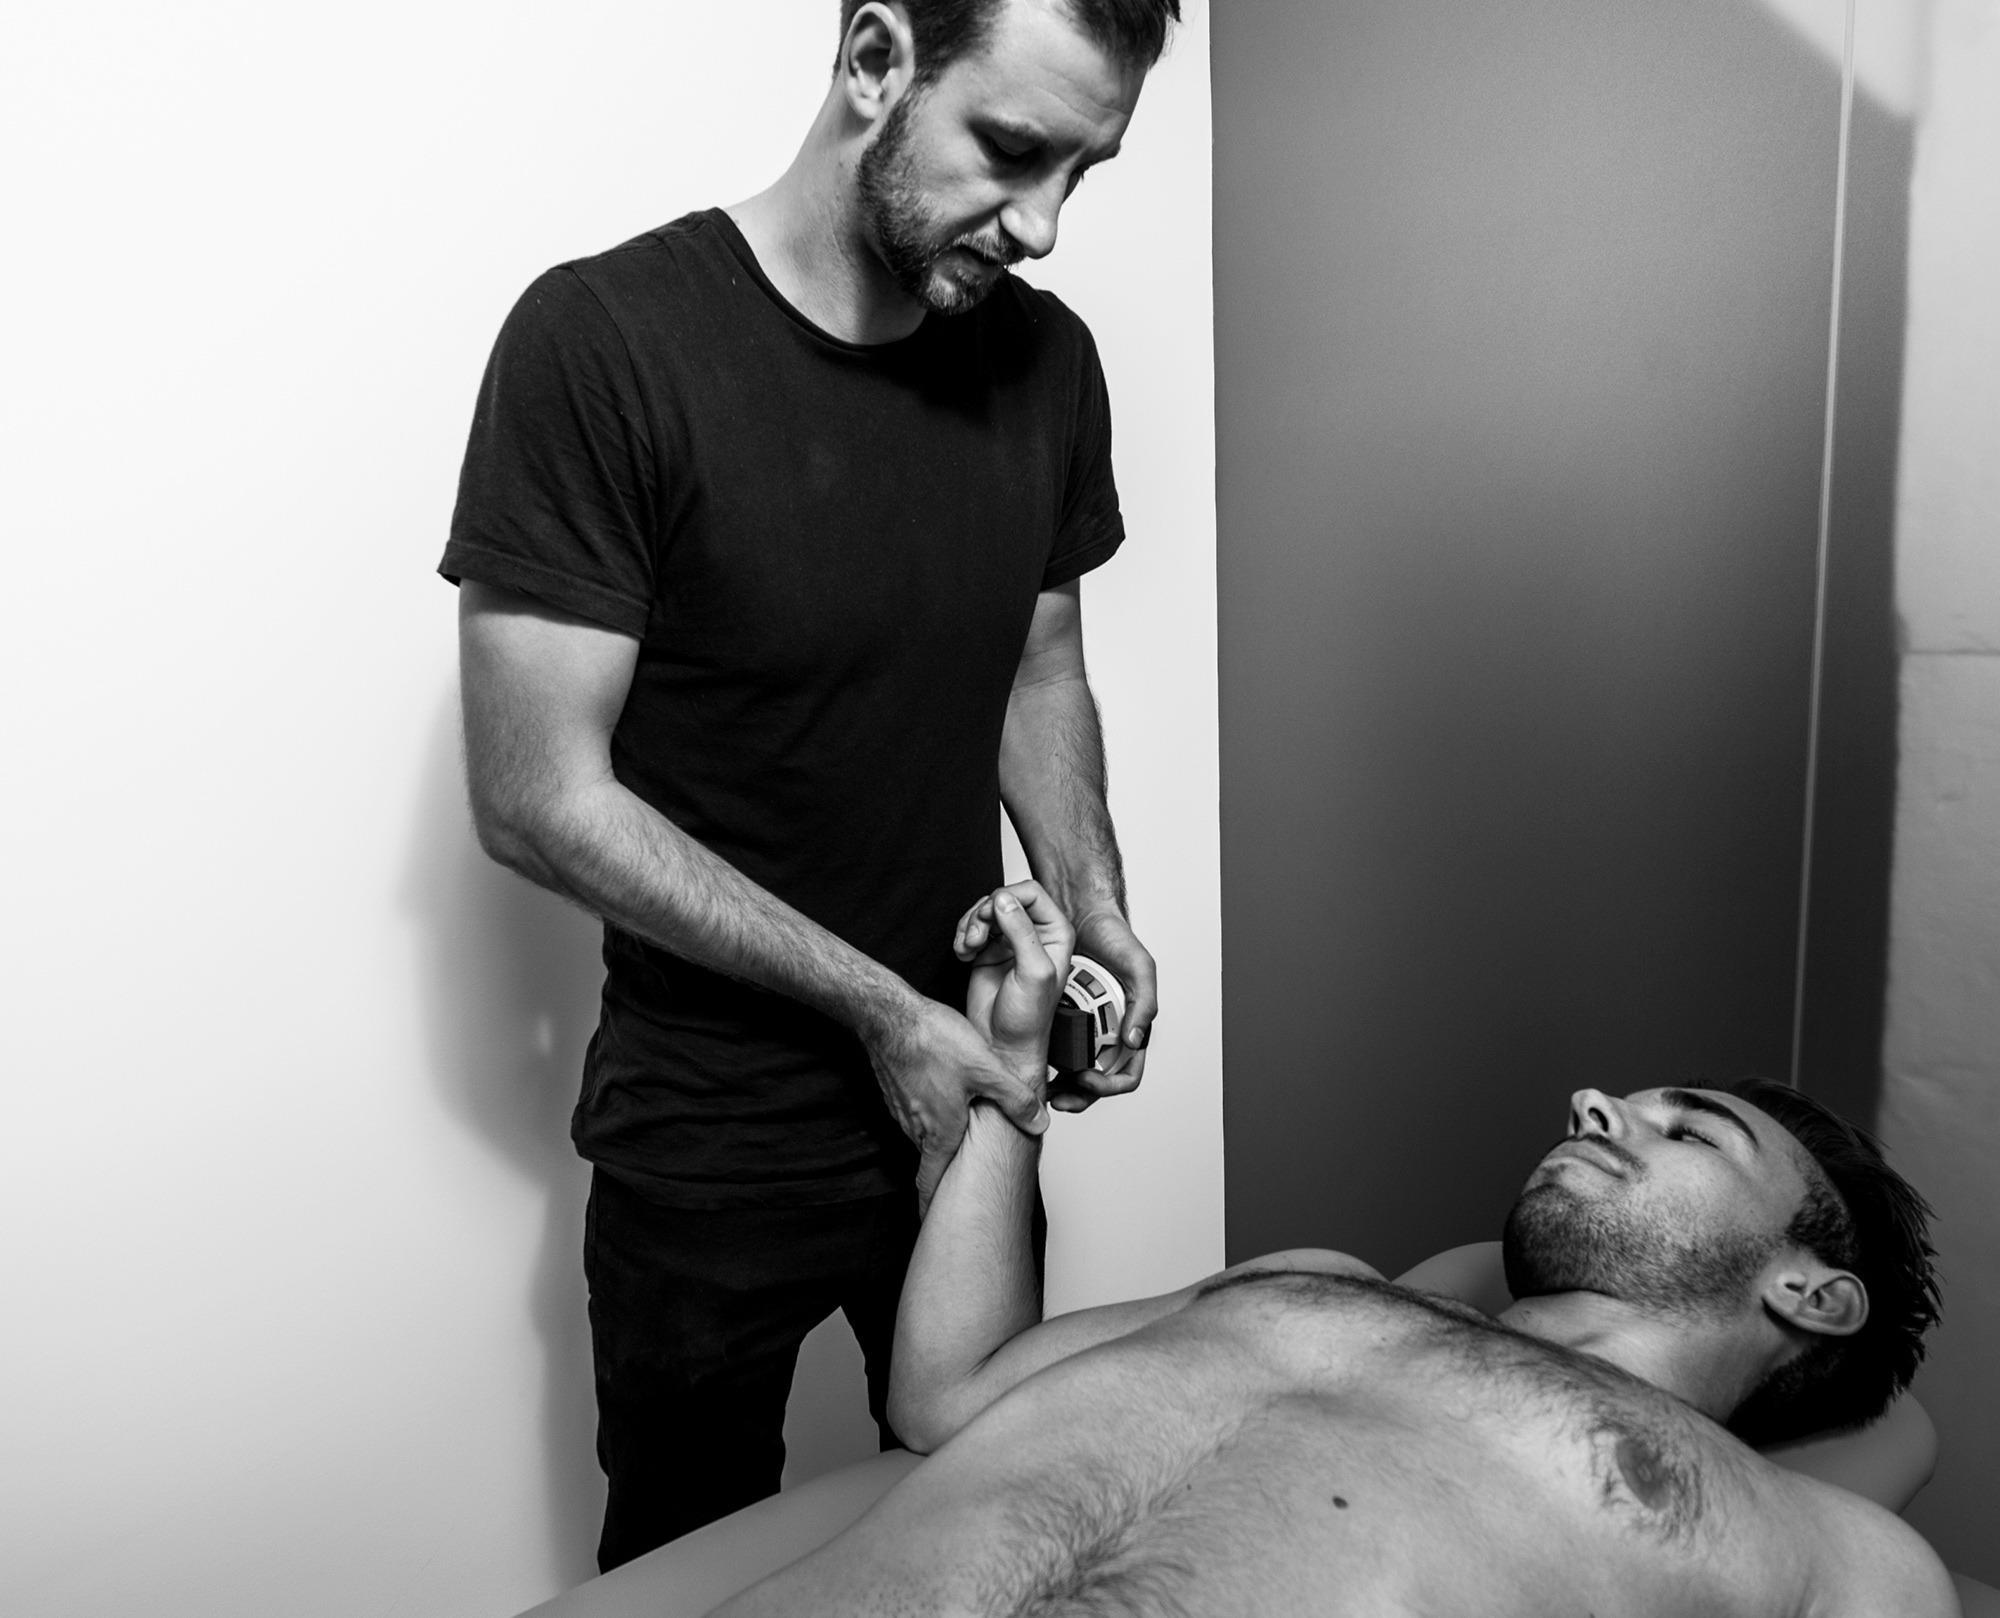 Test af skuldersmerter hos fysioterapeut i Sportsfysioterapien